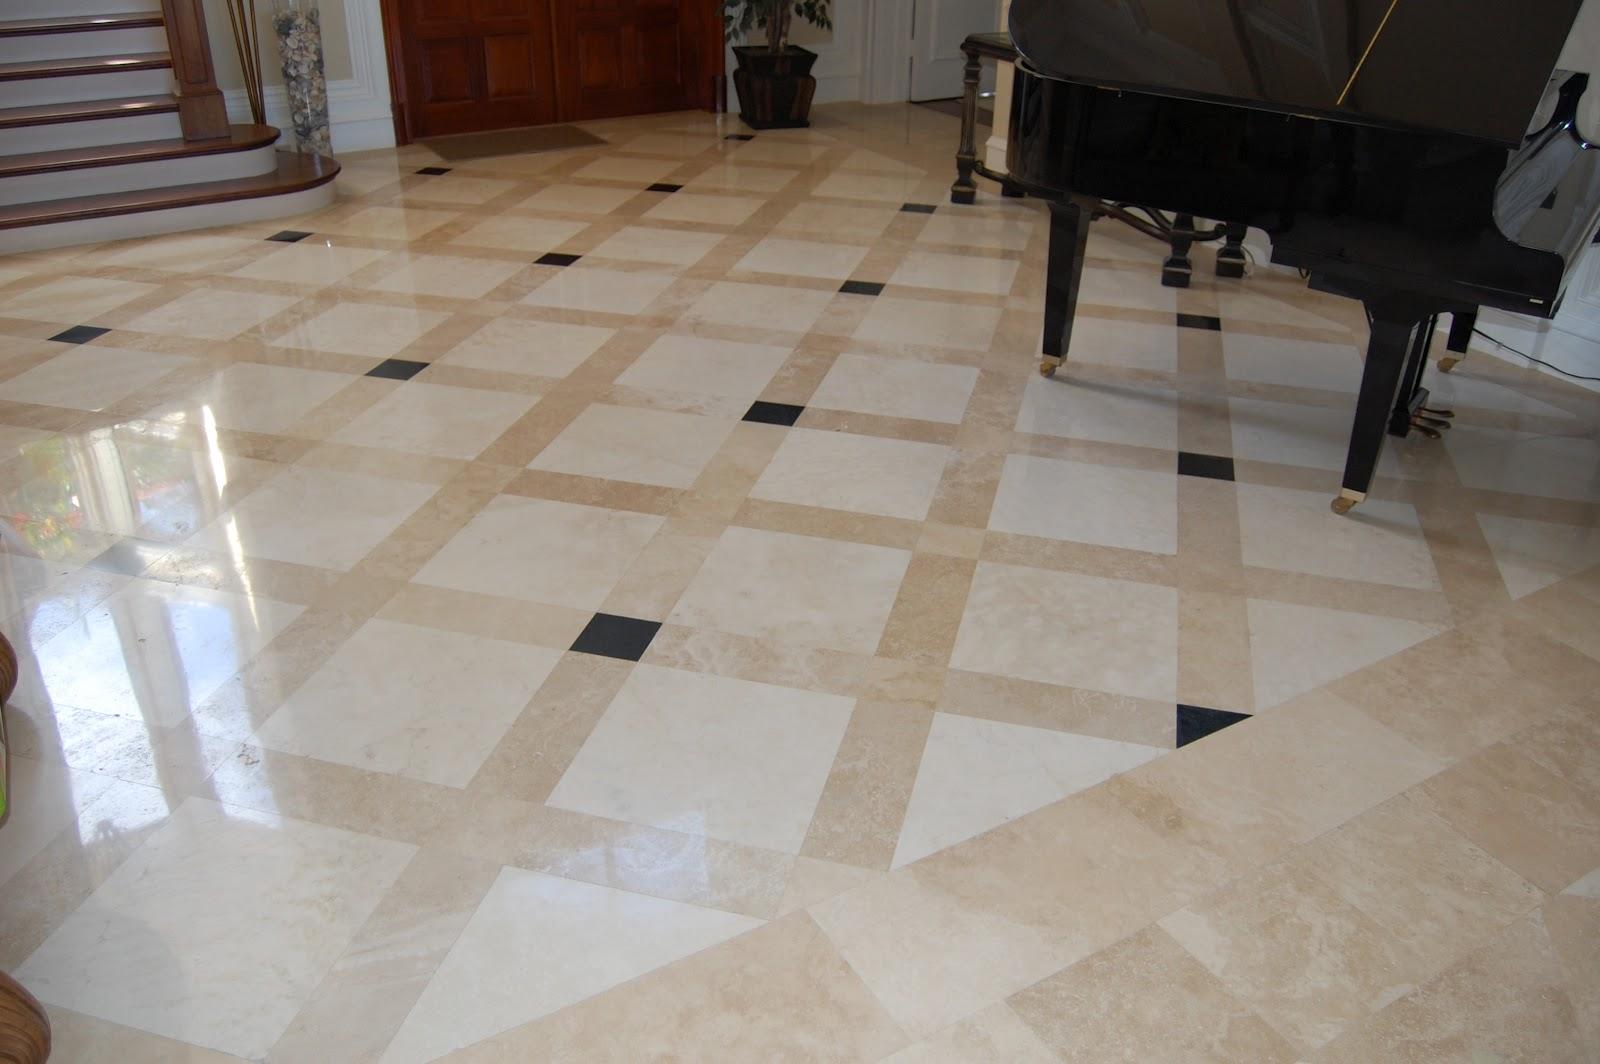 Terrazzo Floor Vs Carpet